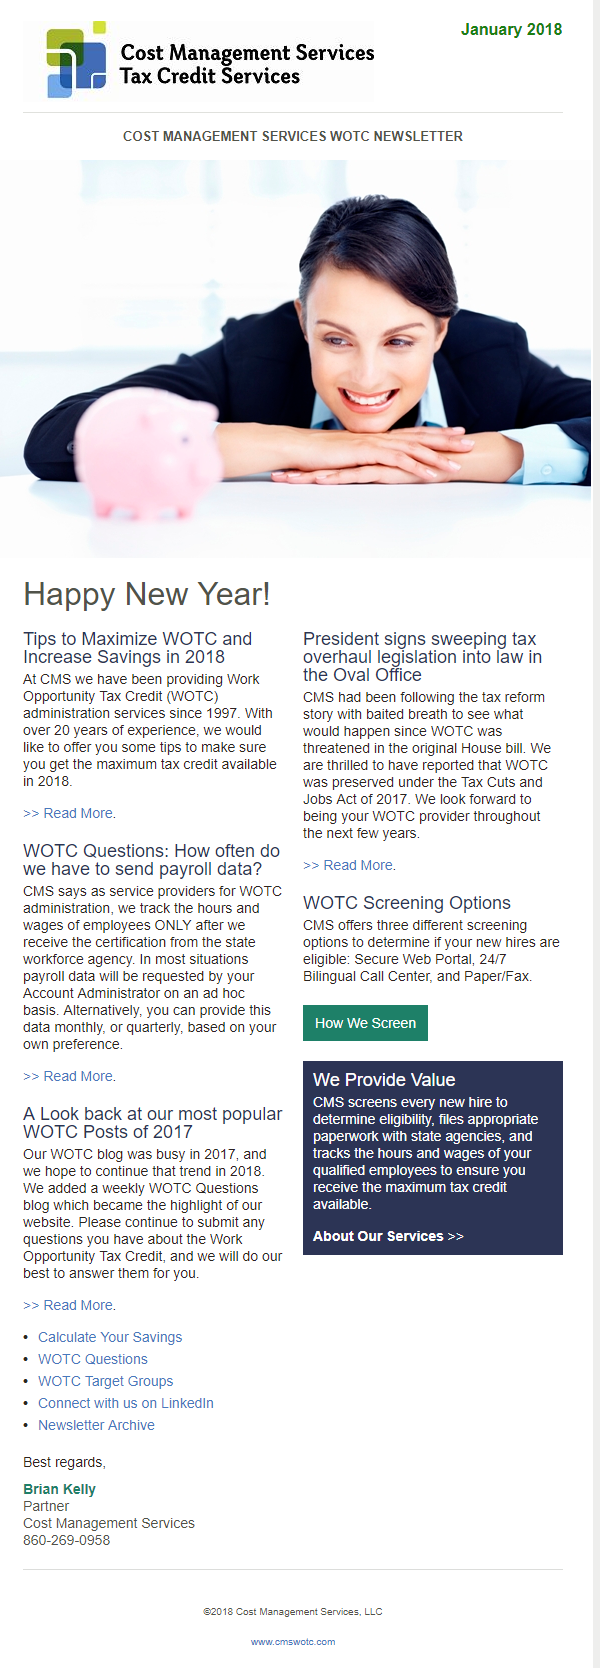 WOTC Newsletter January 2018